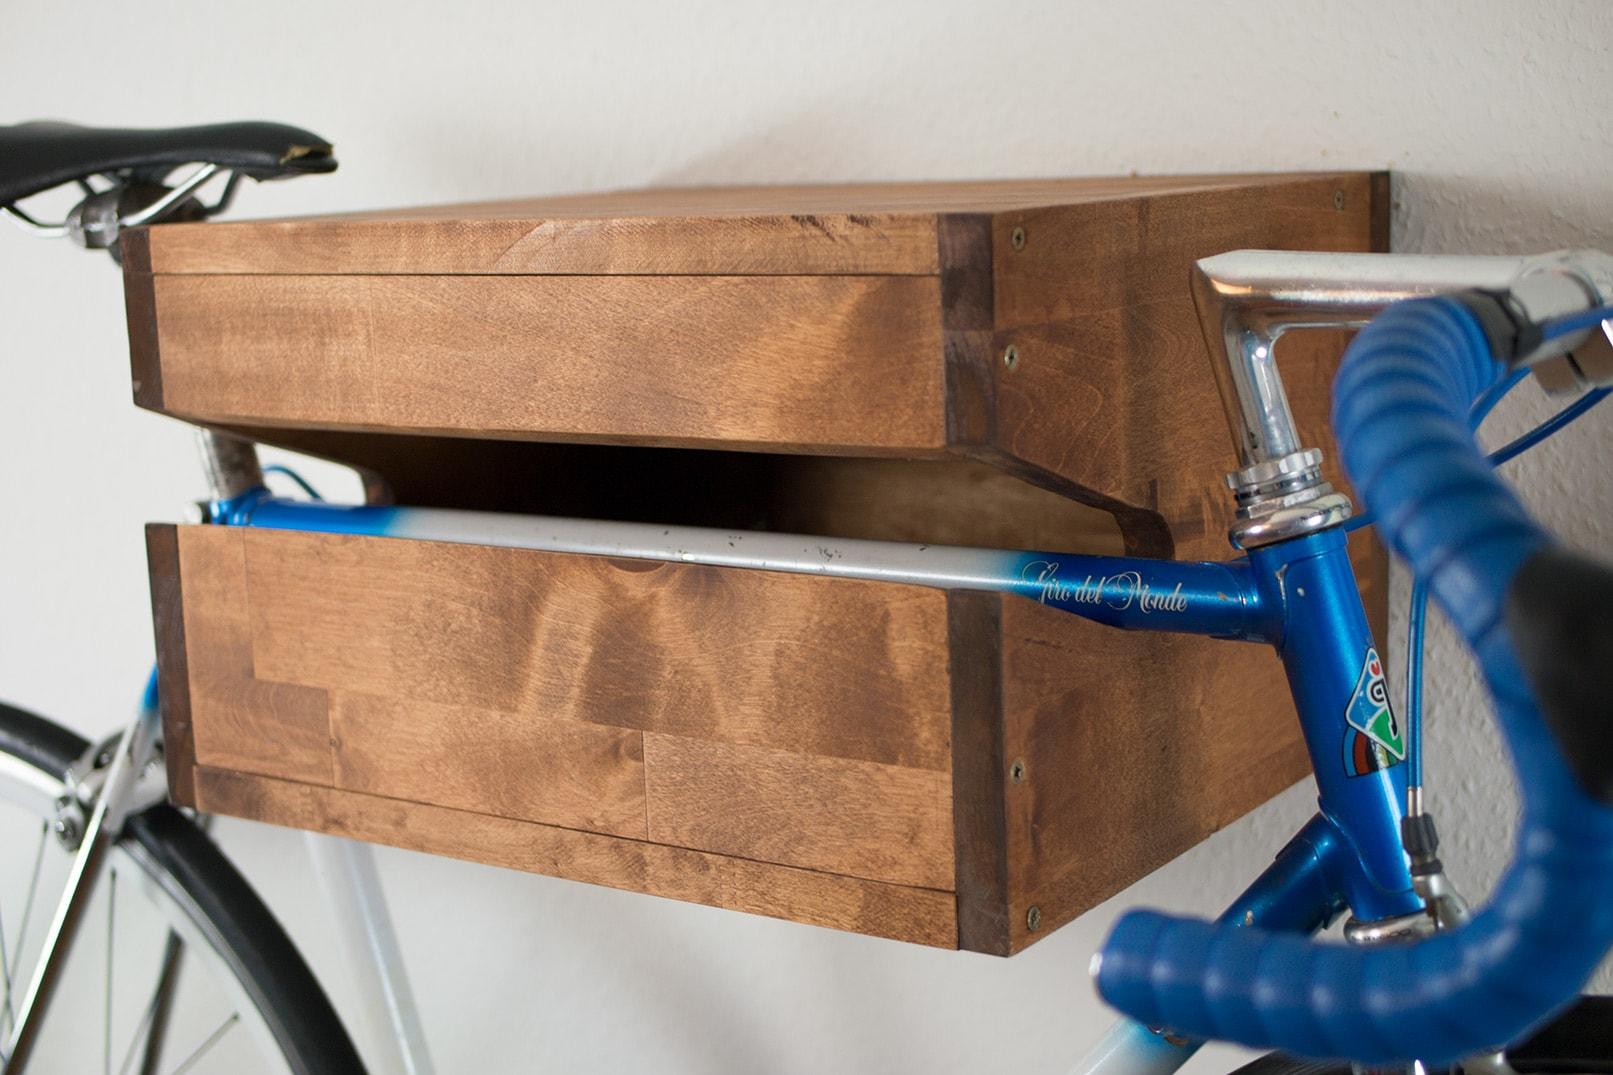 fahrrad wandhalterung selber bauen anleitung fotos bauma e frnet. Black Bedroom Furniture Sets. Home Design Ideas